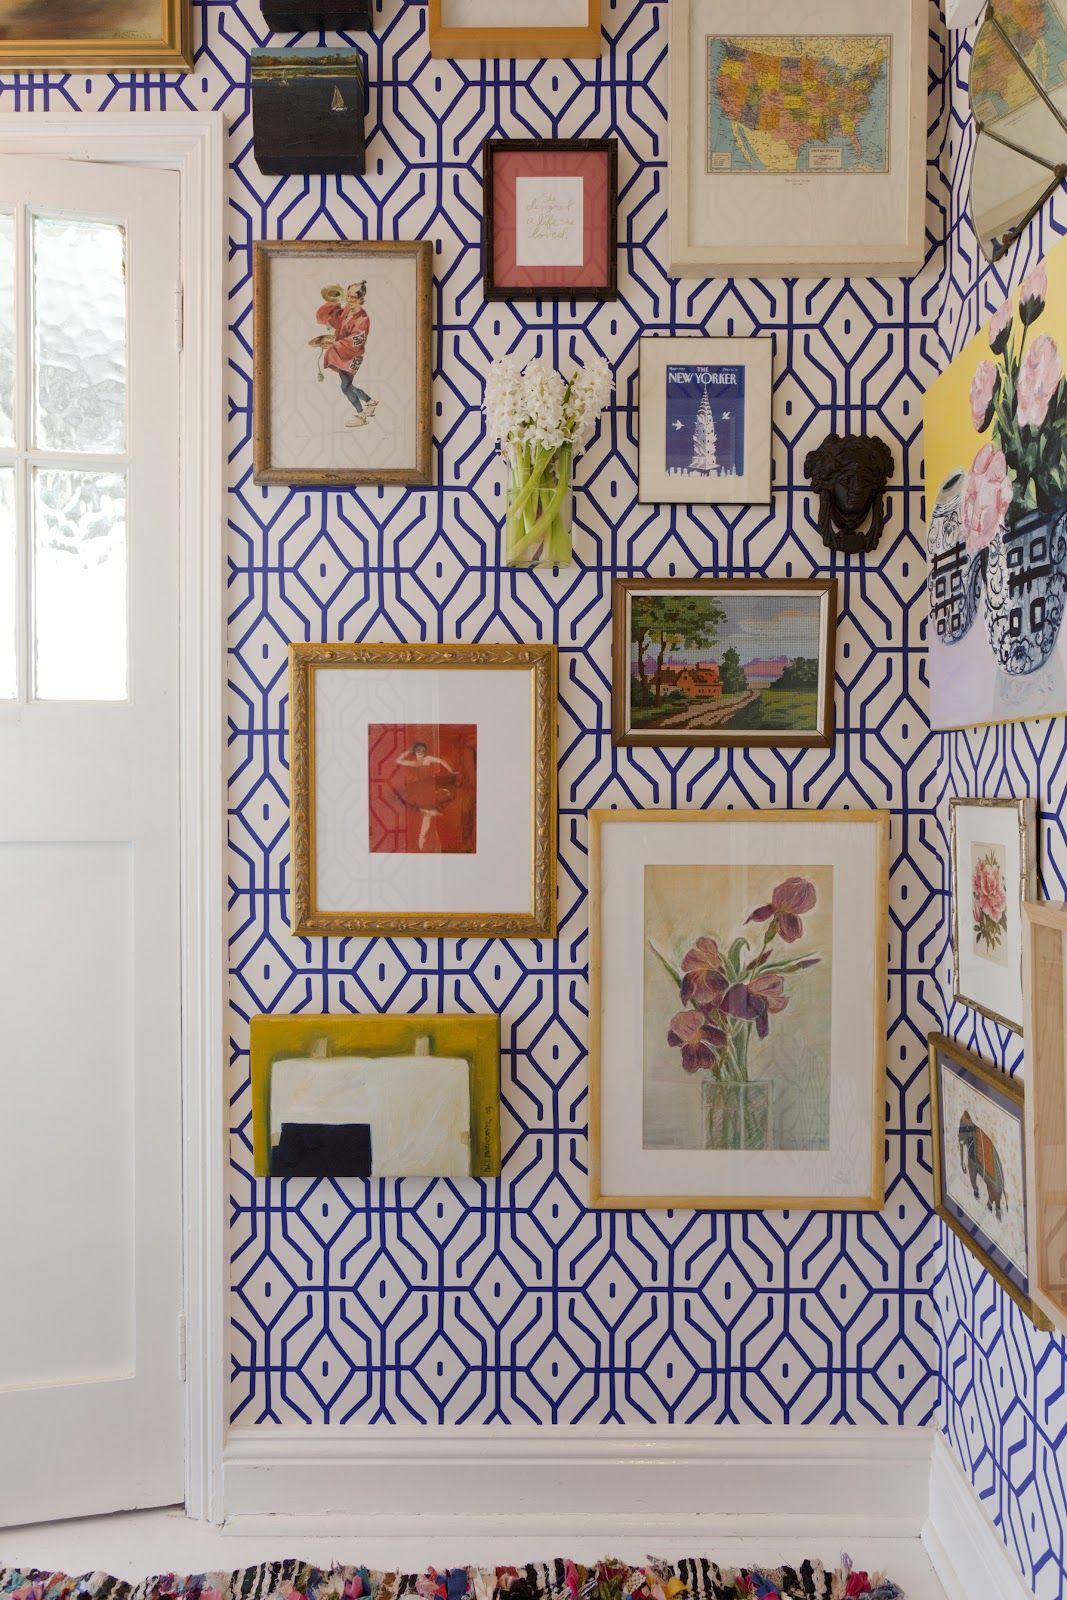 fabulous wallpaper meets a gallery wall